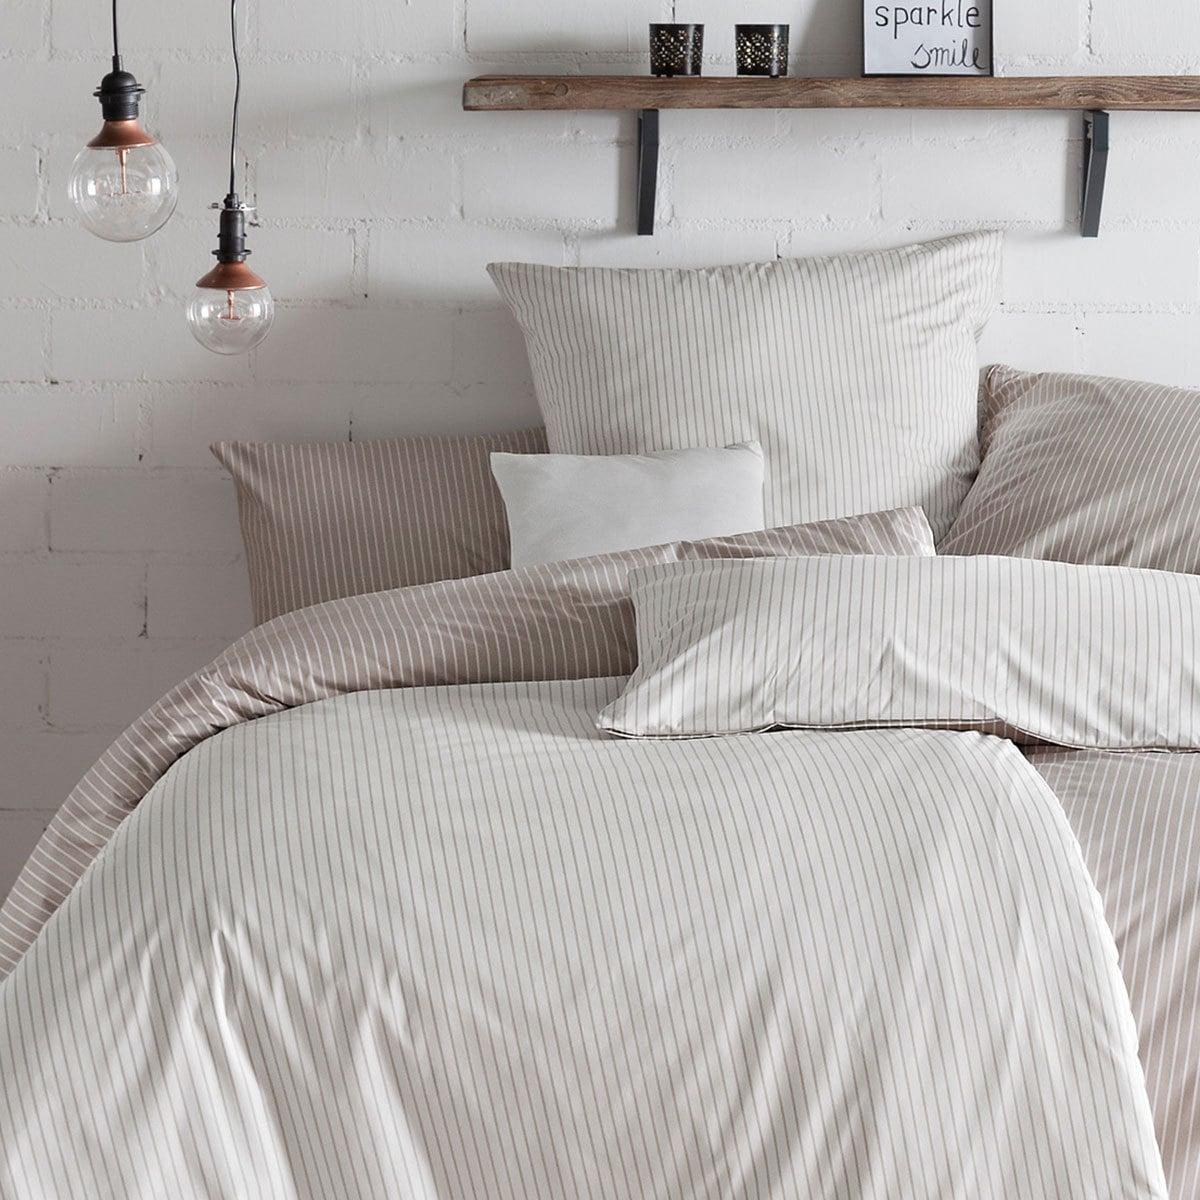 estella mako perkal wendebettw sche ronda kiesel g nstig online kaufen bei bettwaren shop. Black Bedroom Furniture Sets. Home Design Ideas